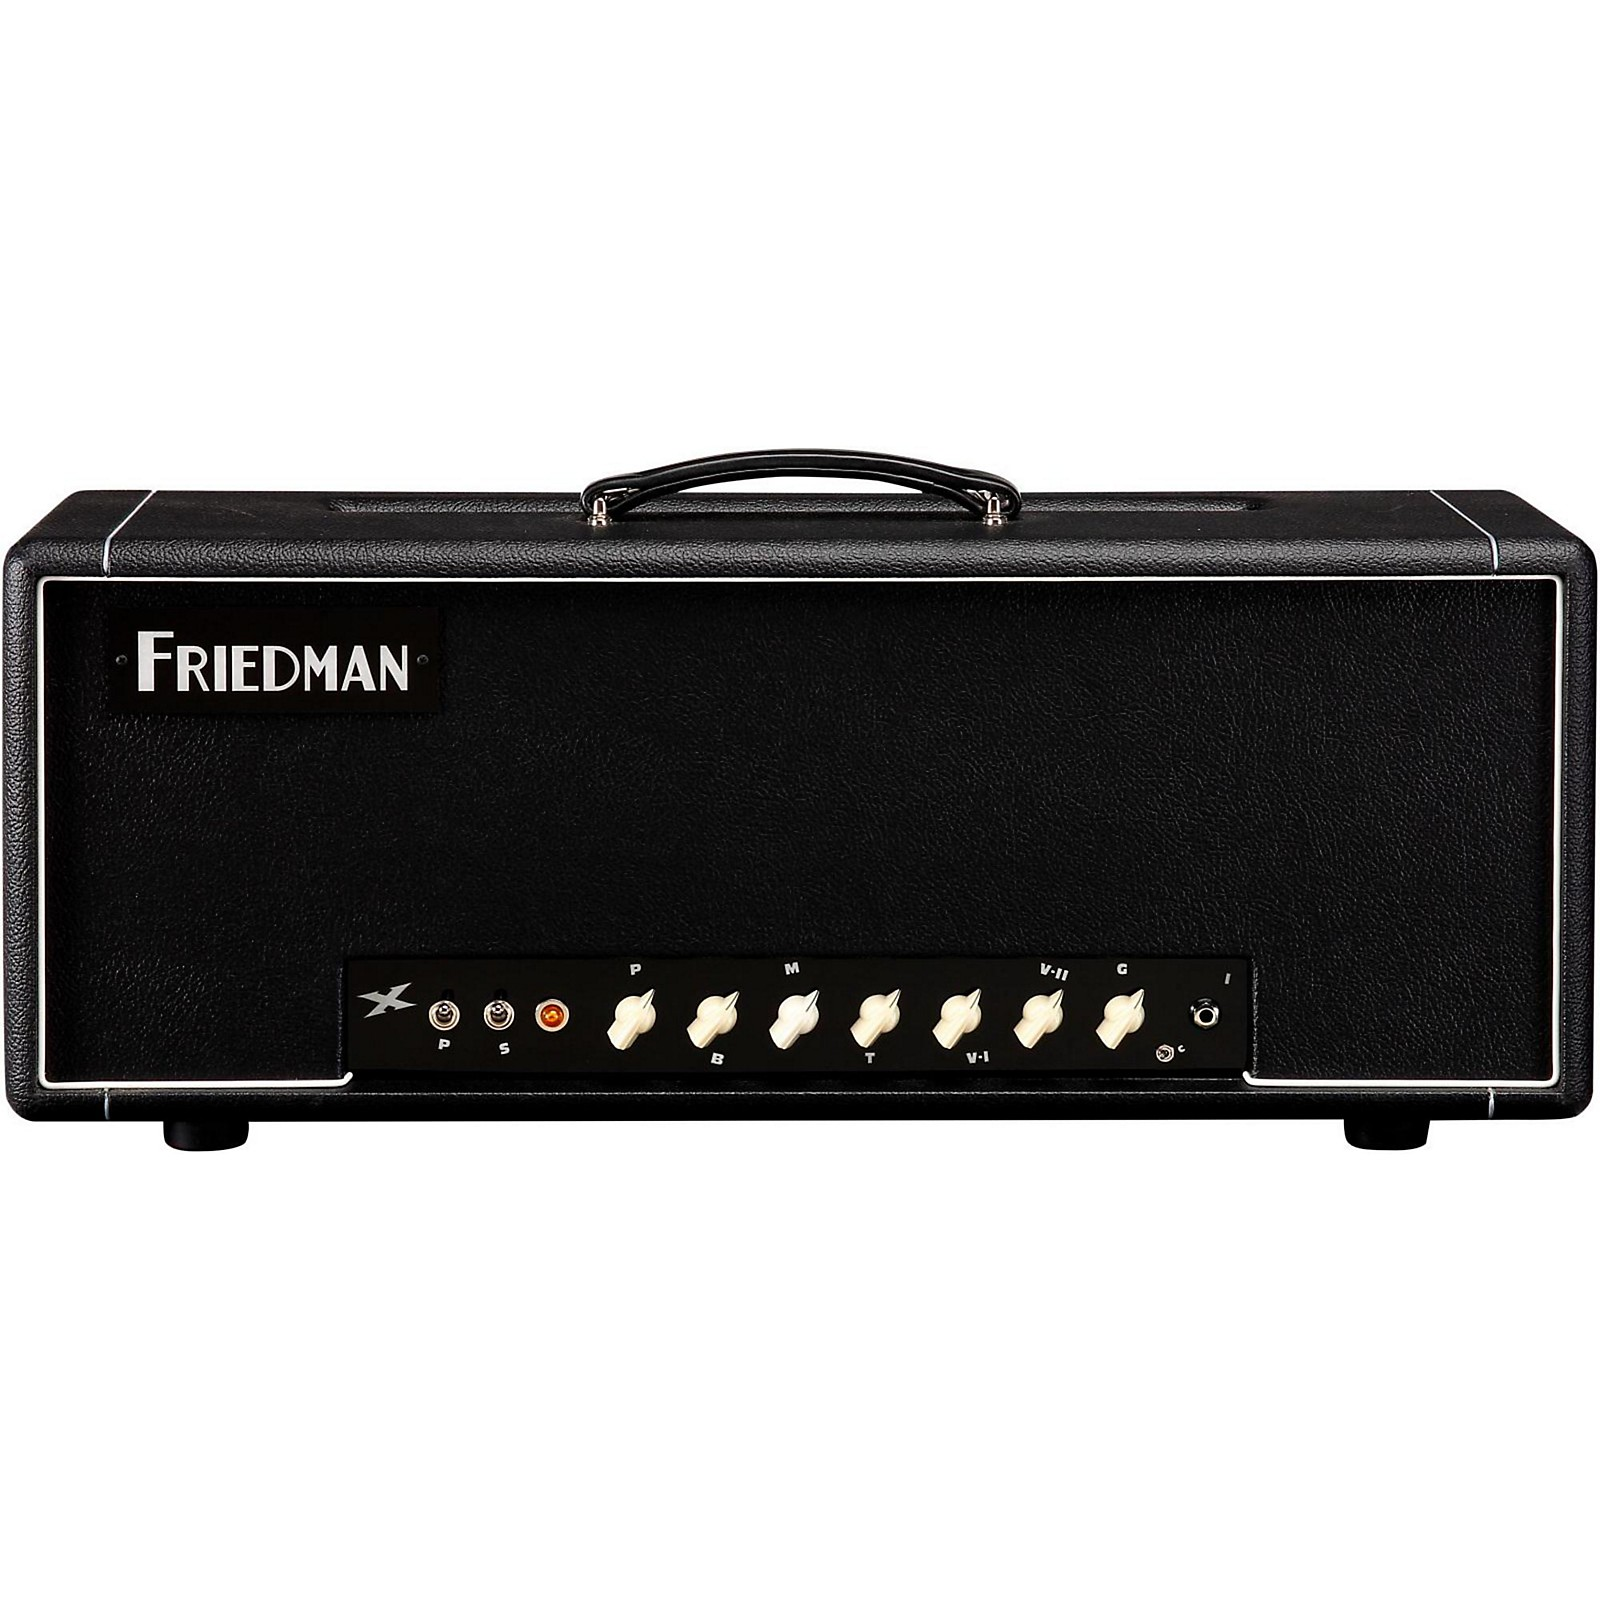 Open Box Friedman Phil X 100W Signature Hand-Wired Tube Guitar Head